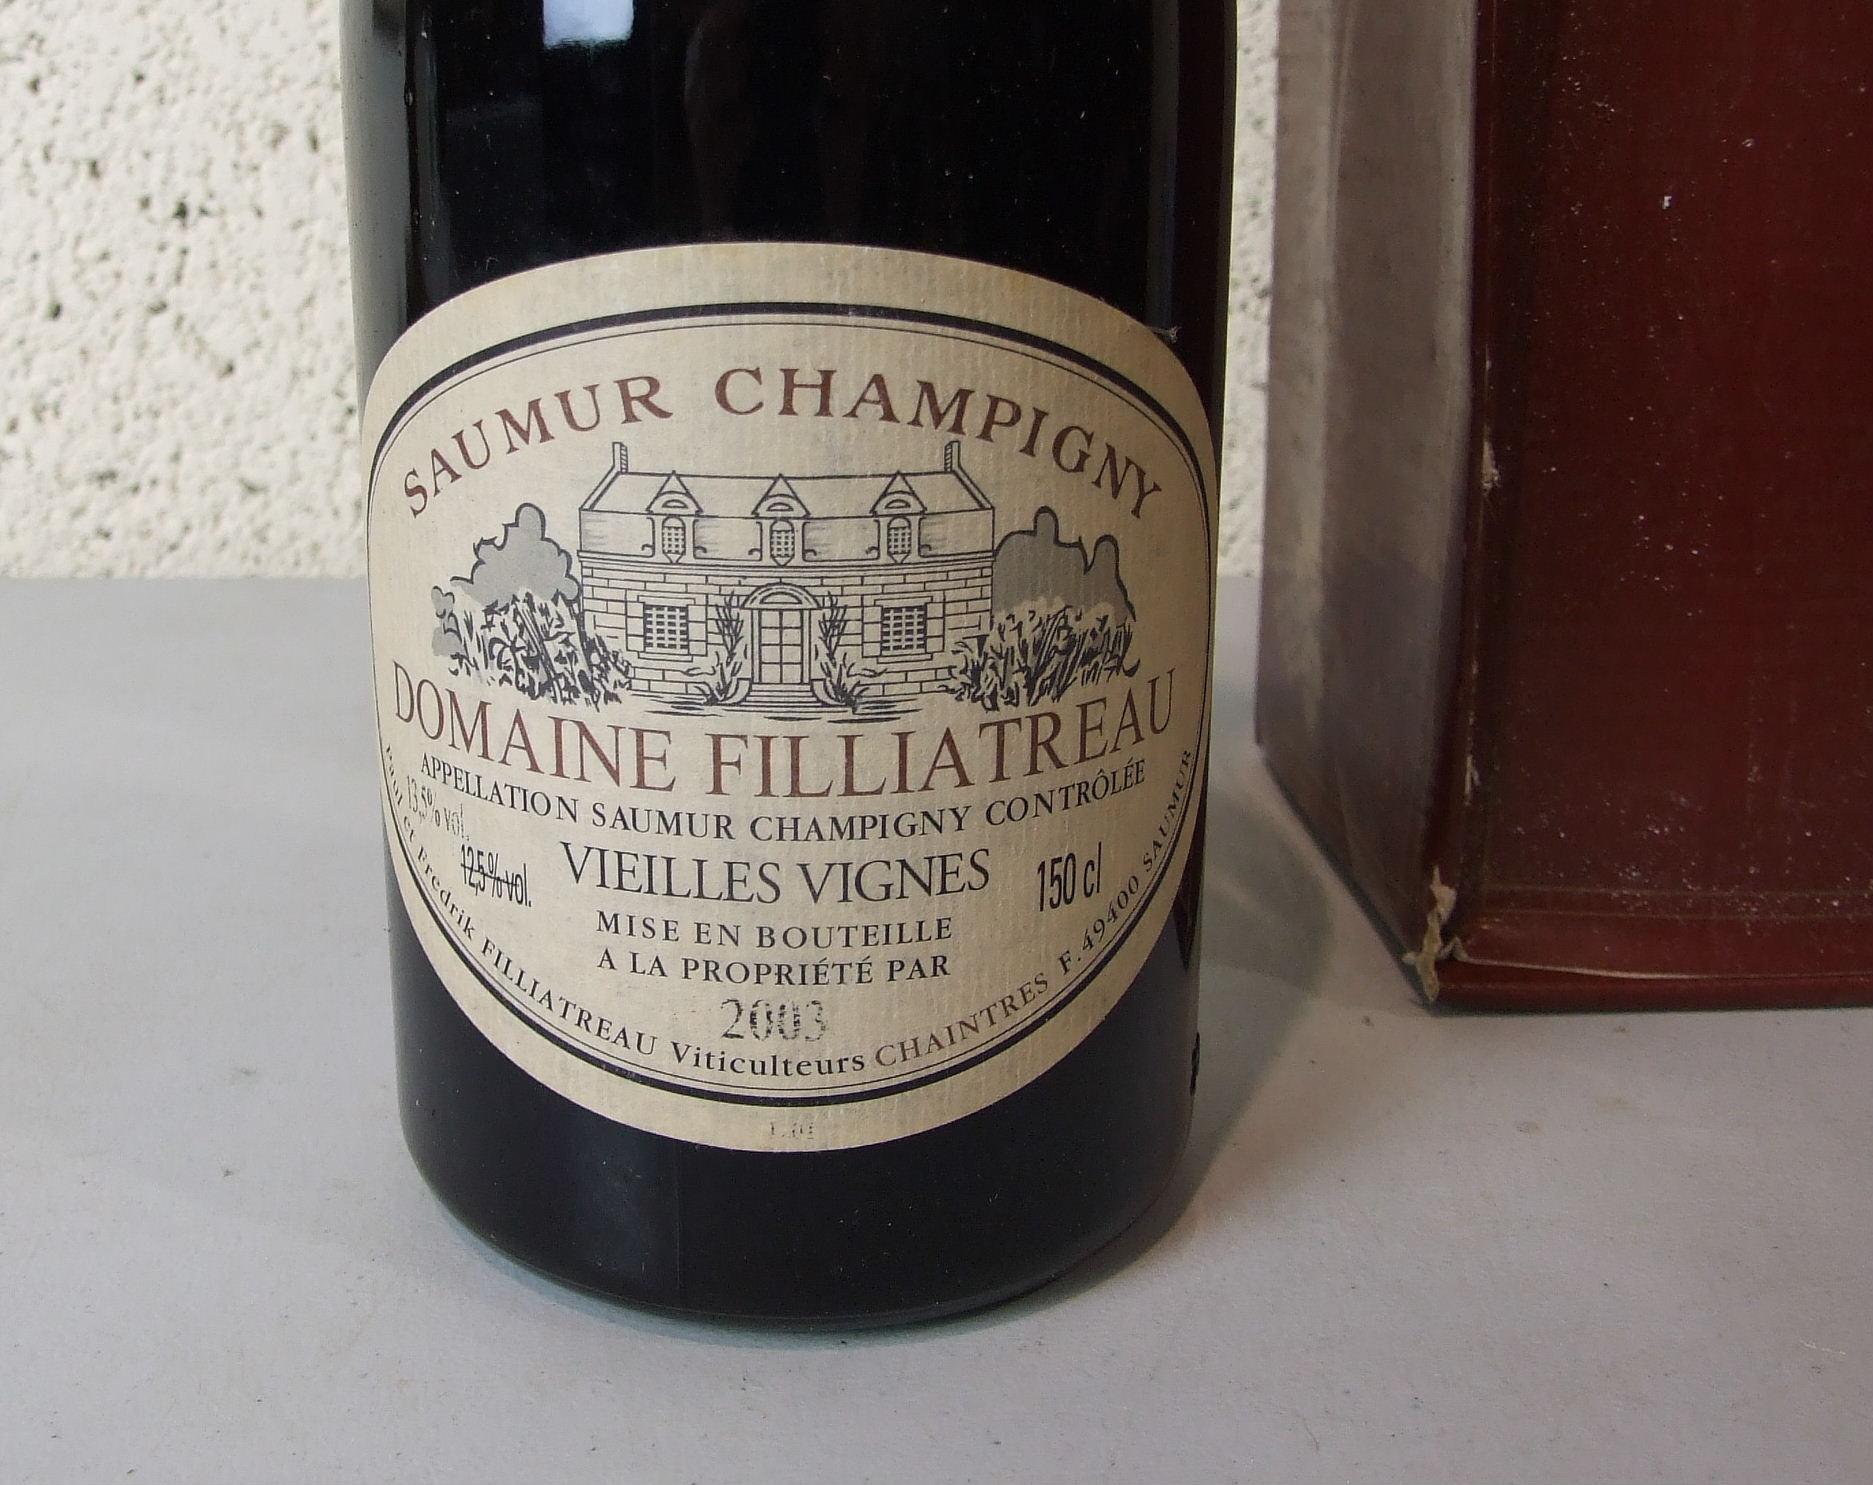 Lot 44 - France, Domaine Filliatreau Saumur Champigny 2003, one magnum, (1).